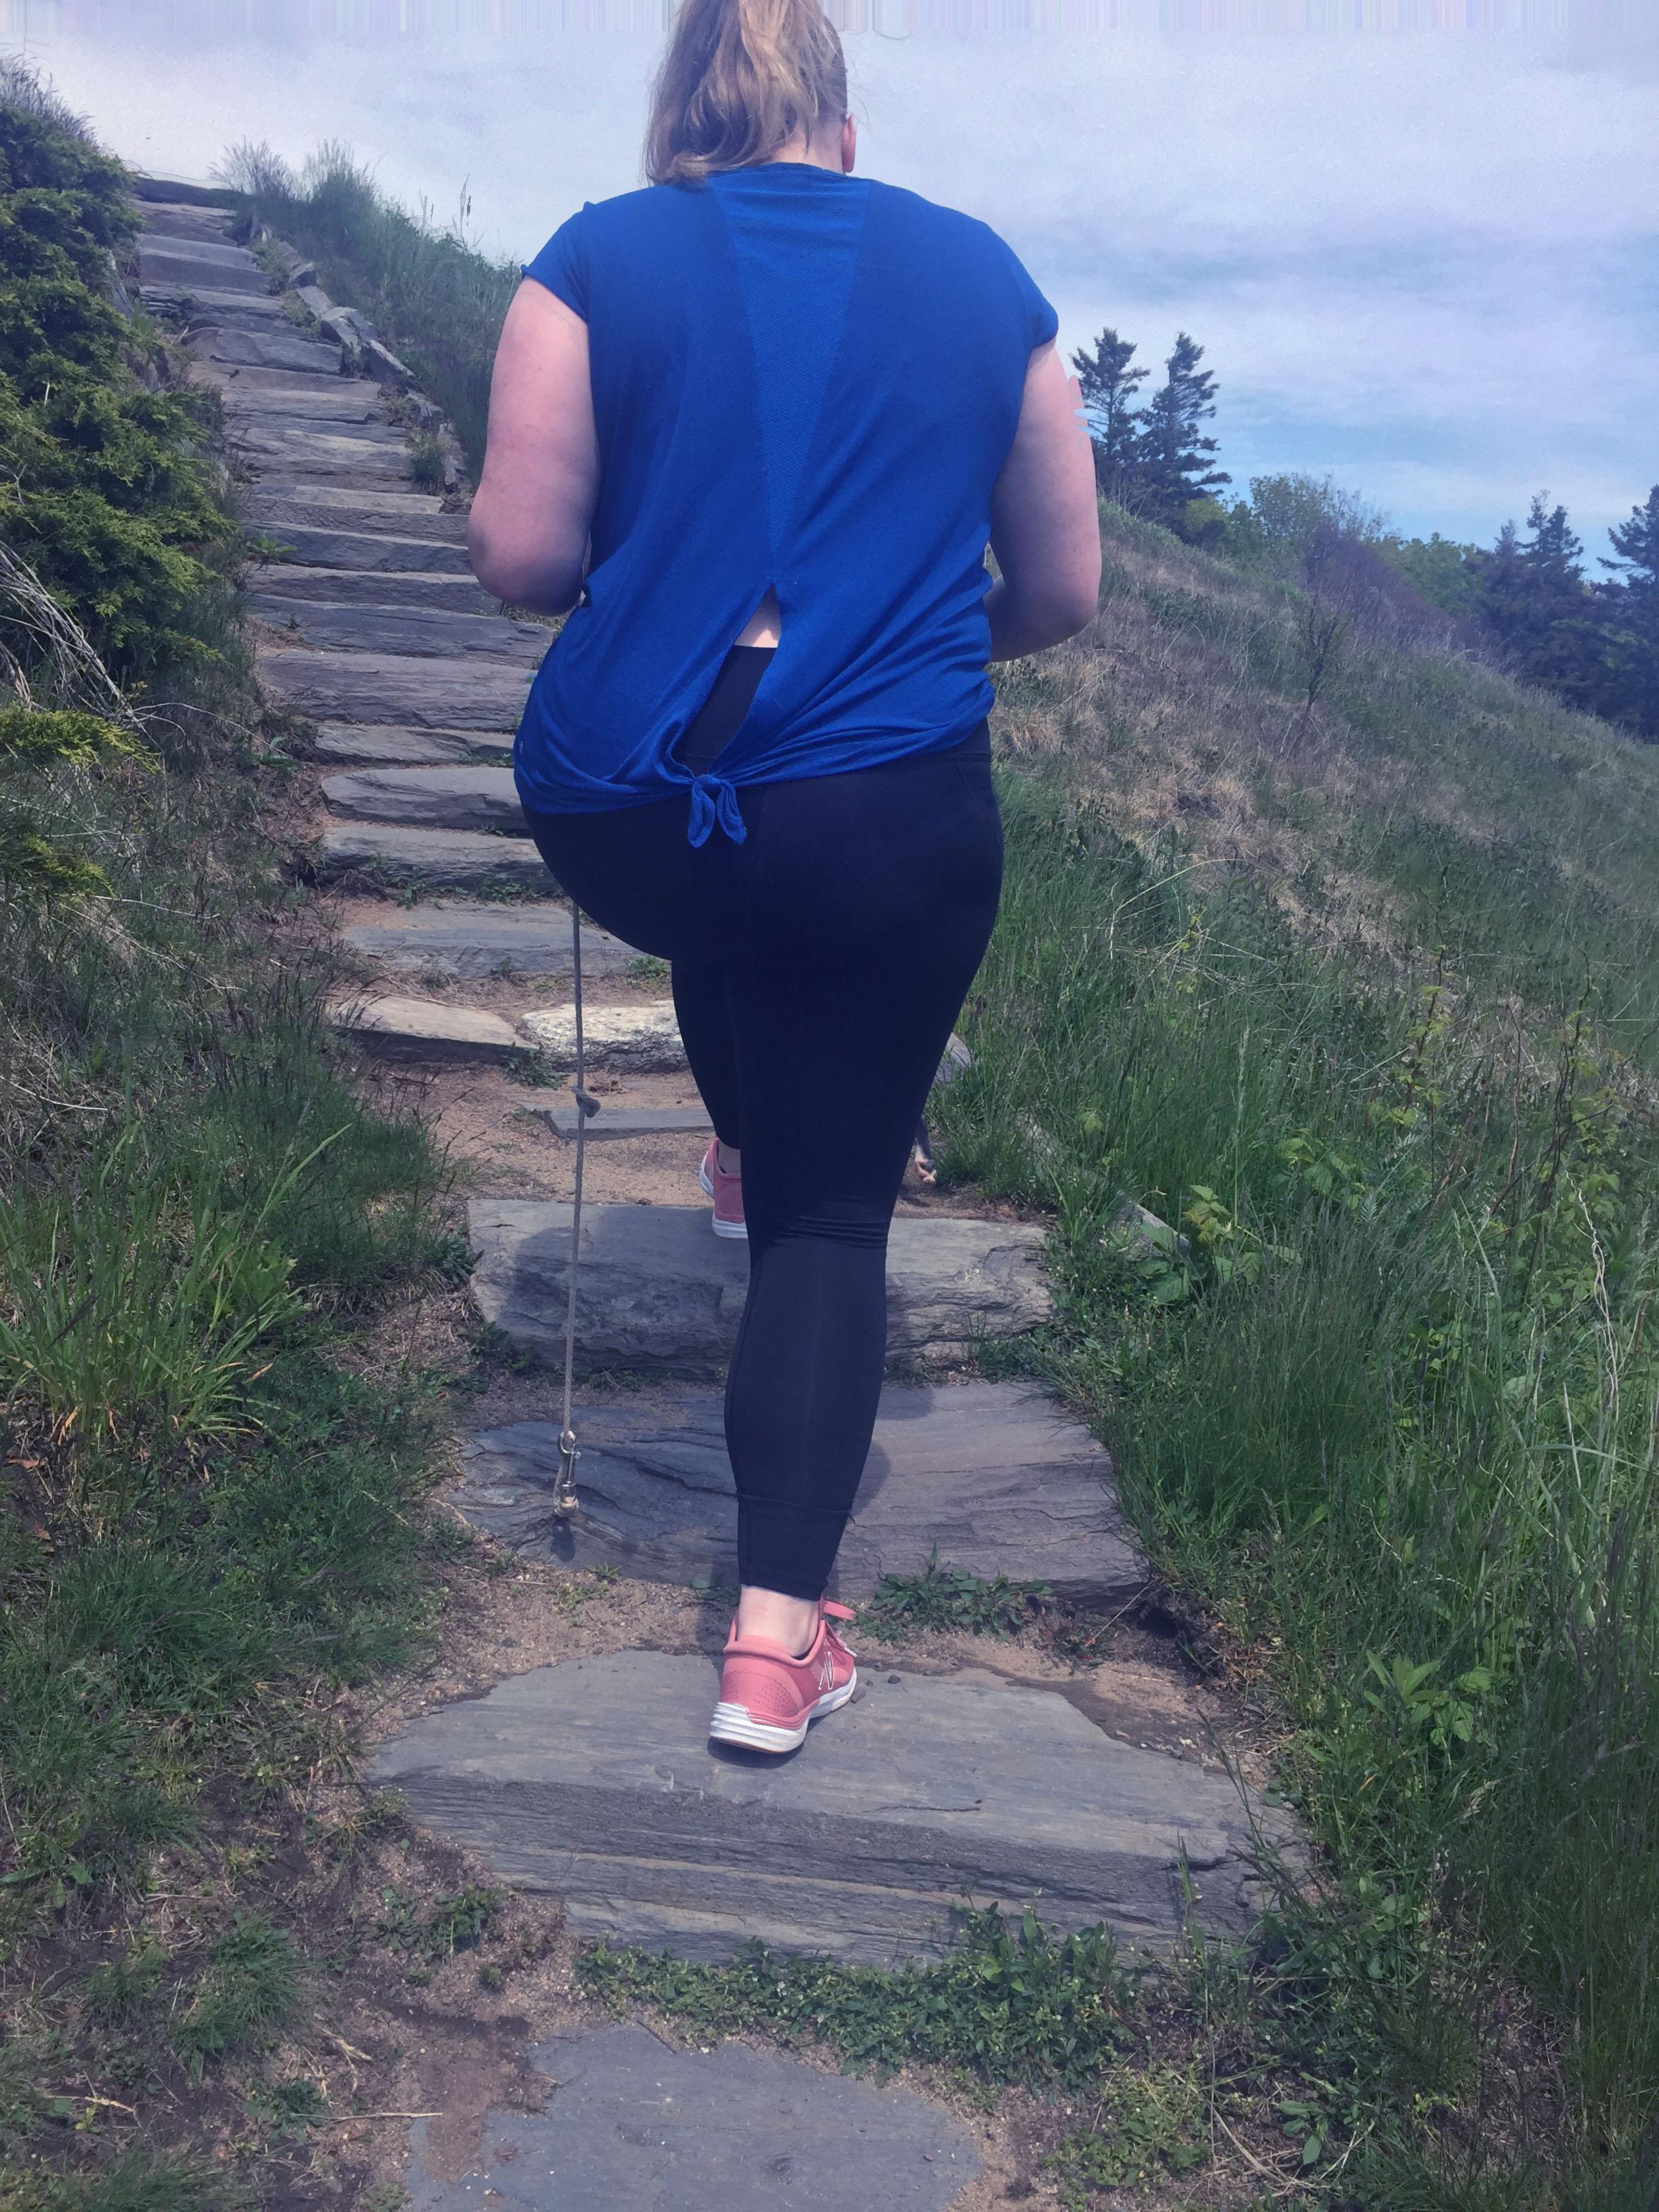 Squat Proof Leggings: Fabletics High-Waisted PowerHold Leggings | Laurel and Iron Review.jpg